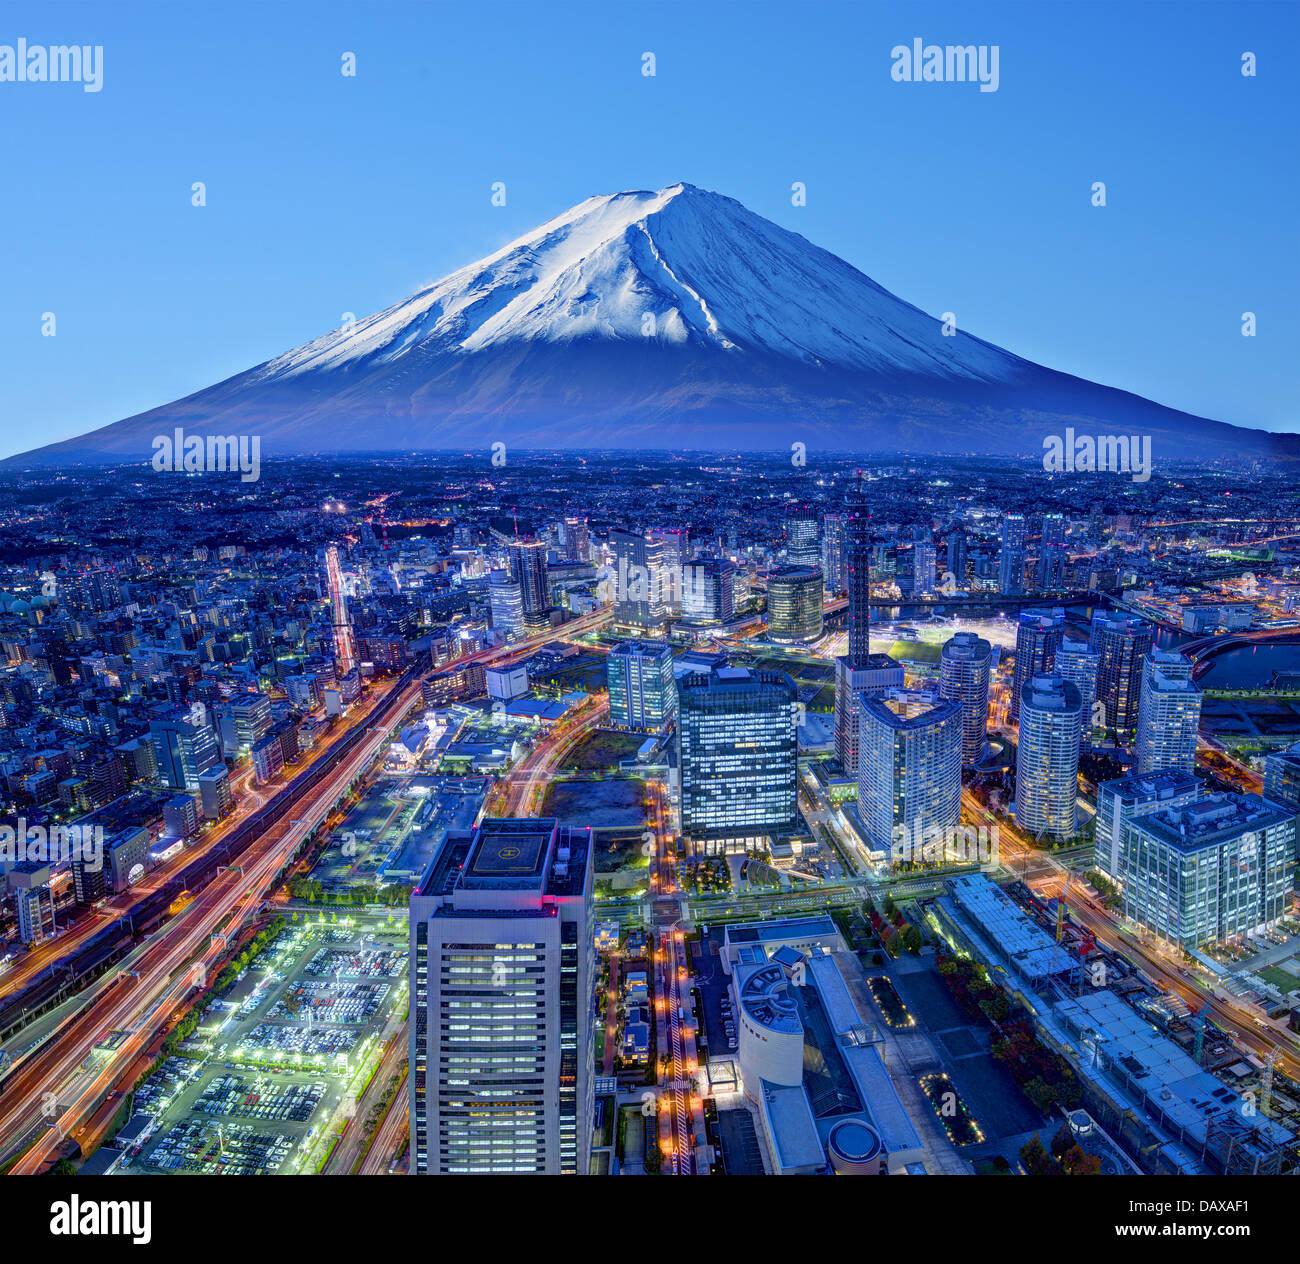 Skyline di Mt. Fuji e Yokohama, Giappone. Immagini Stock